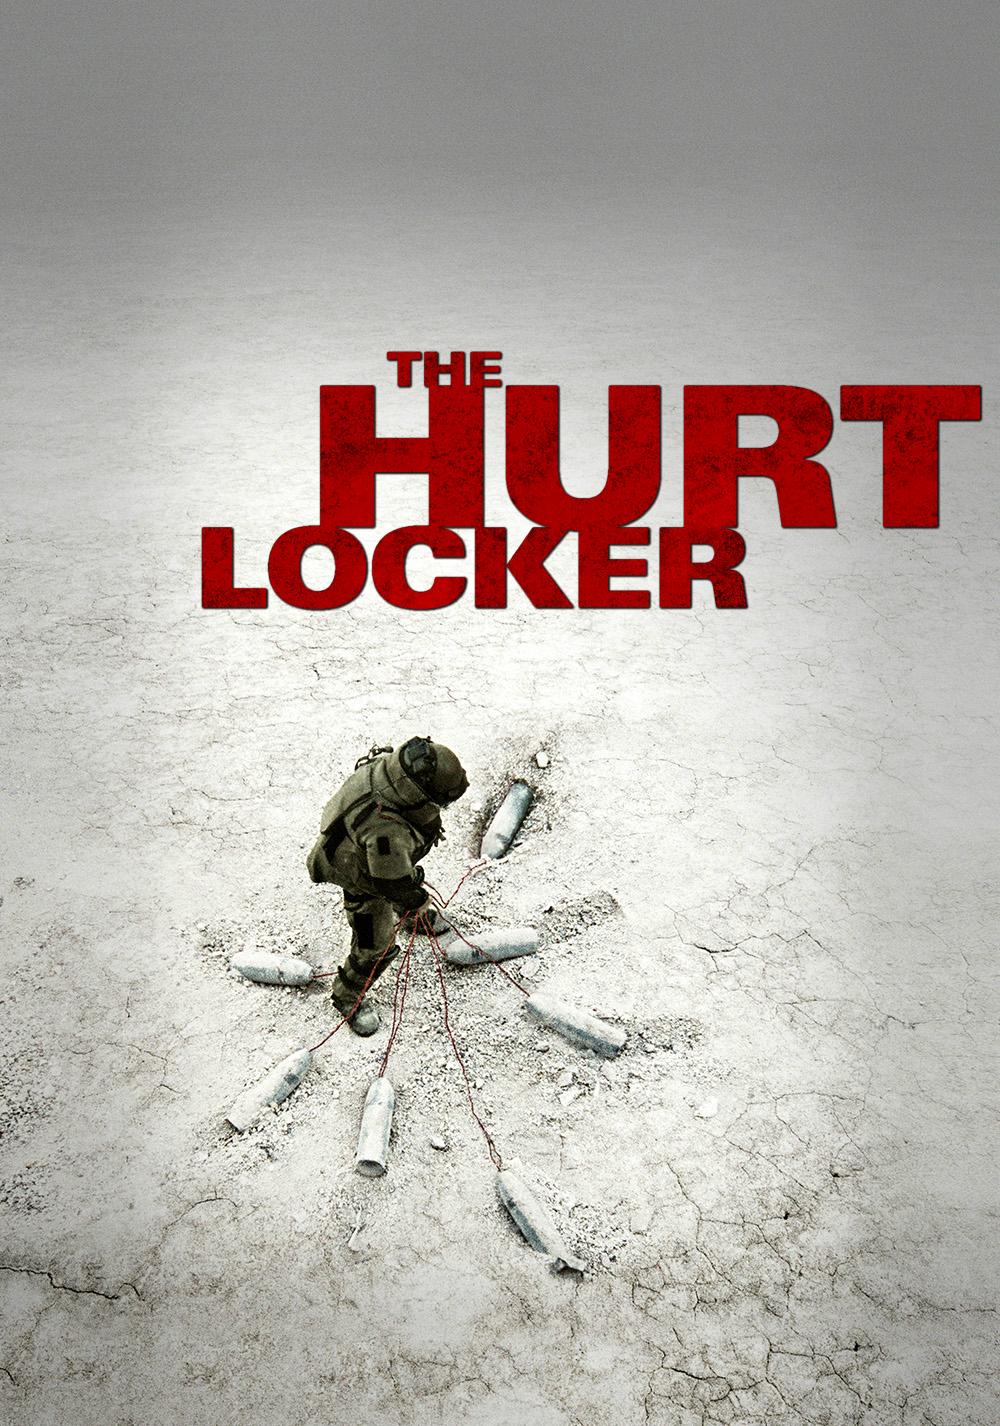 the-hurt-locker-5962ff22acb73.jpg